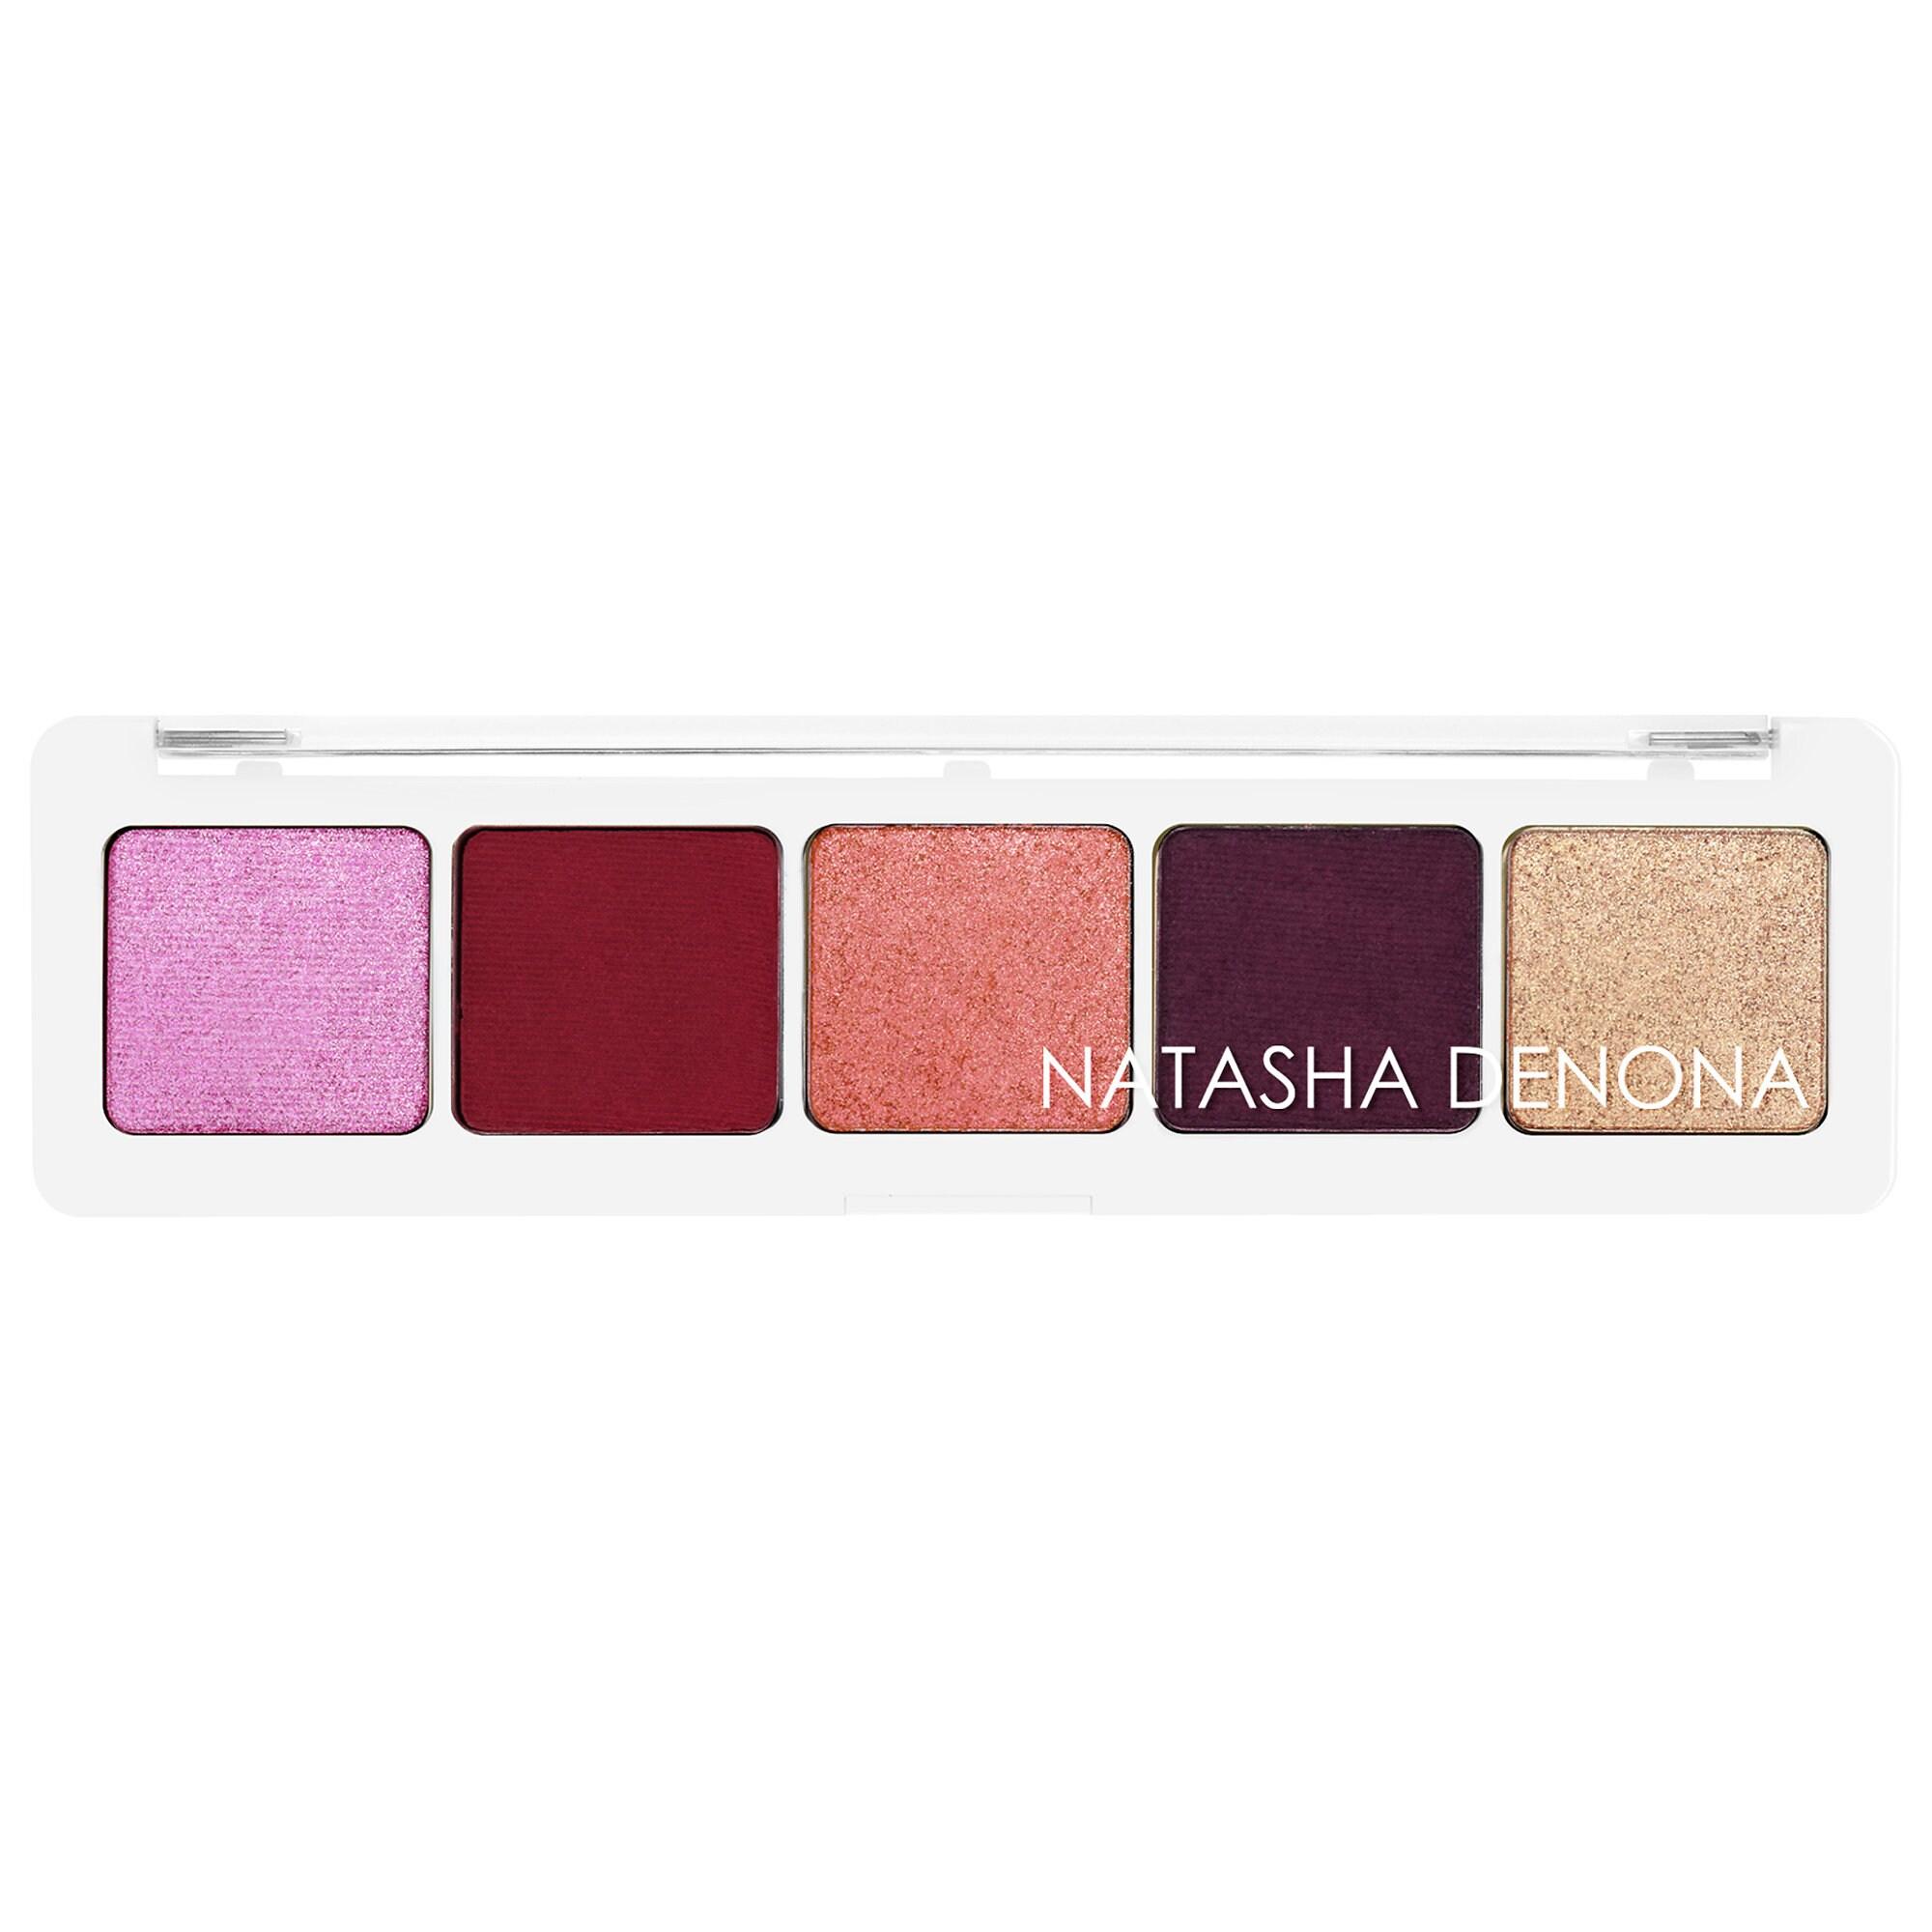 Natasha Denona - Cranberry Eyeshadow Palette